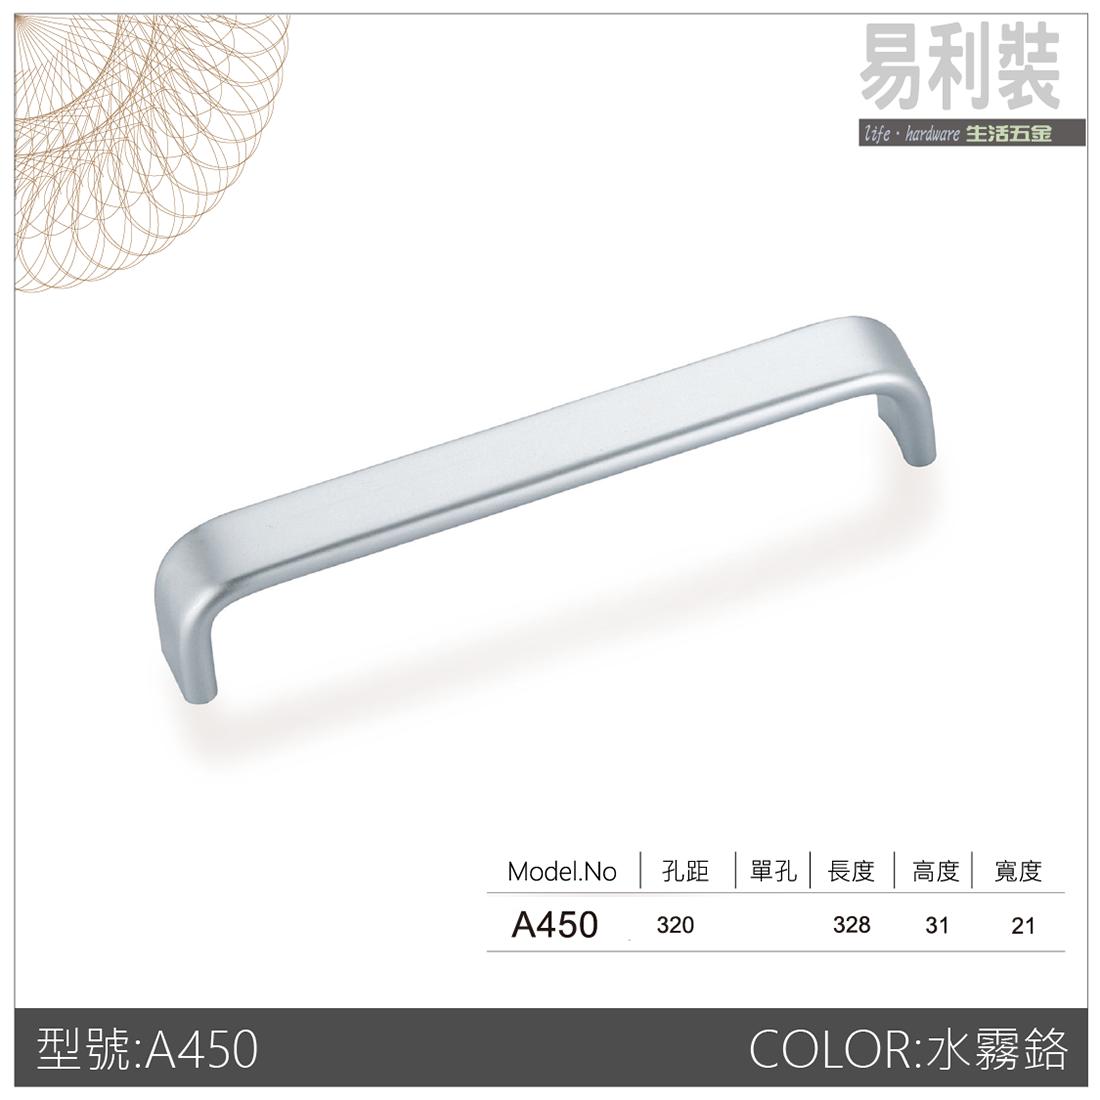 【 EASYCAN  】A450(320) 易利裝生活五金 櫥櫃抽屜把手取手 浴室 廚房 房間 臥房 衣櫃 小資族 辦公家具 系統家具